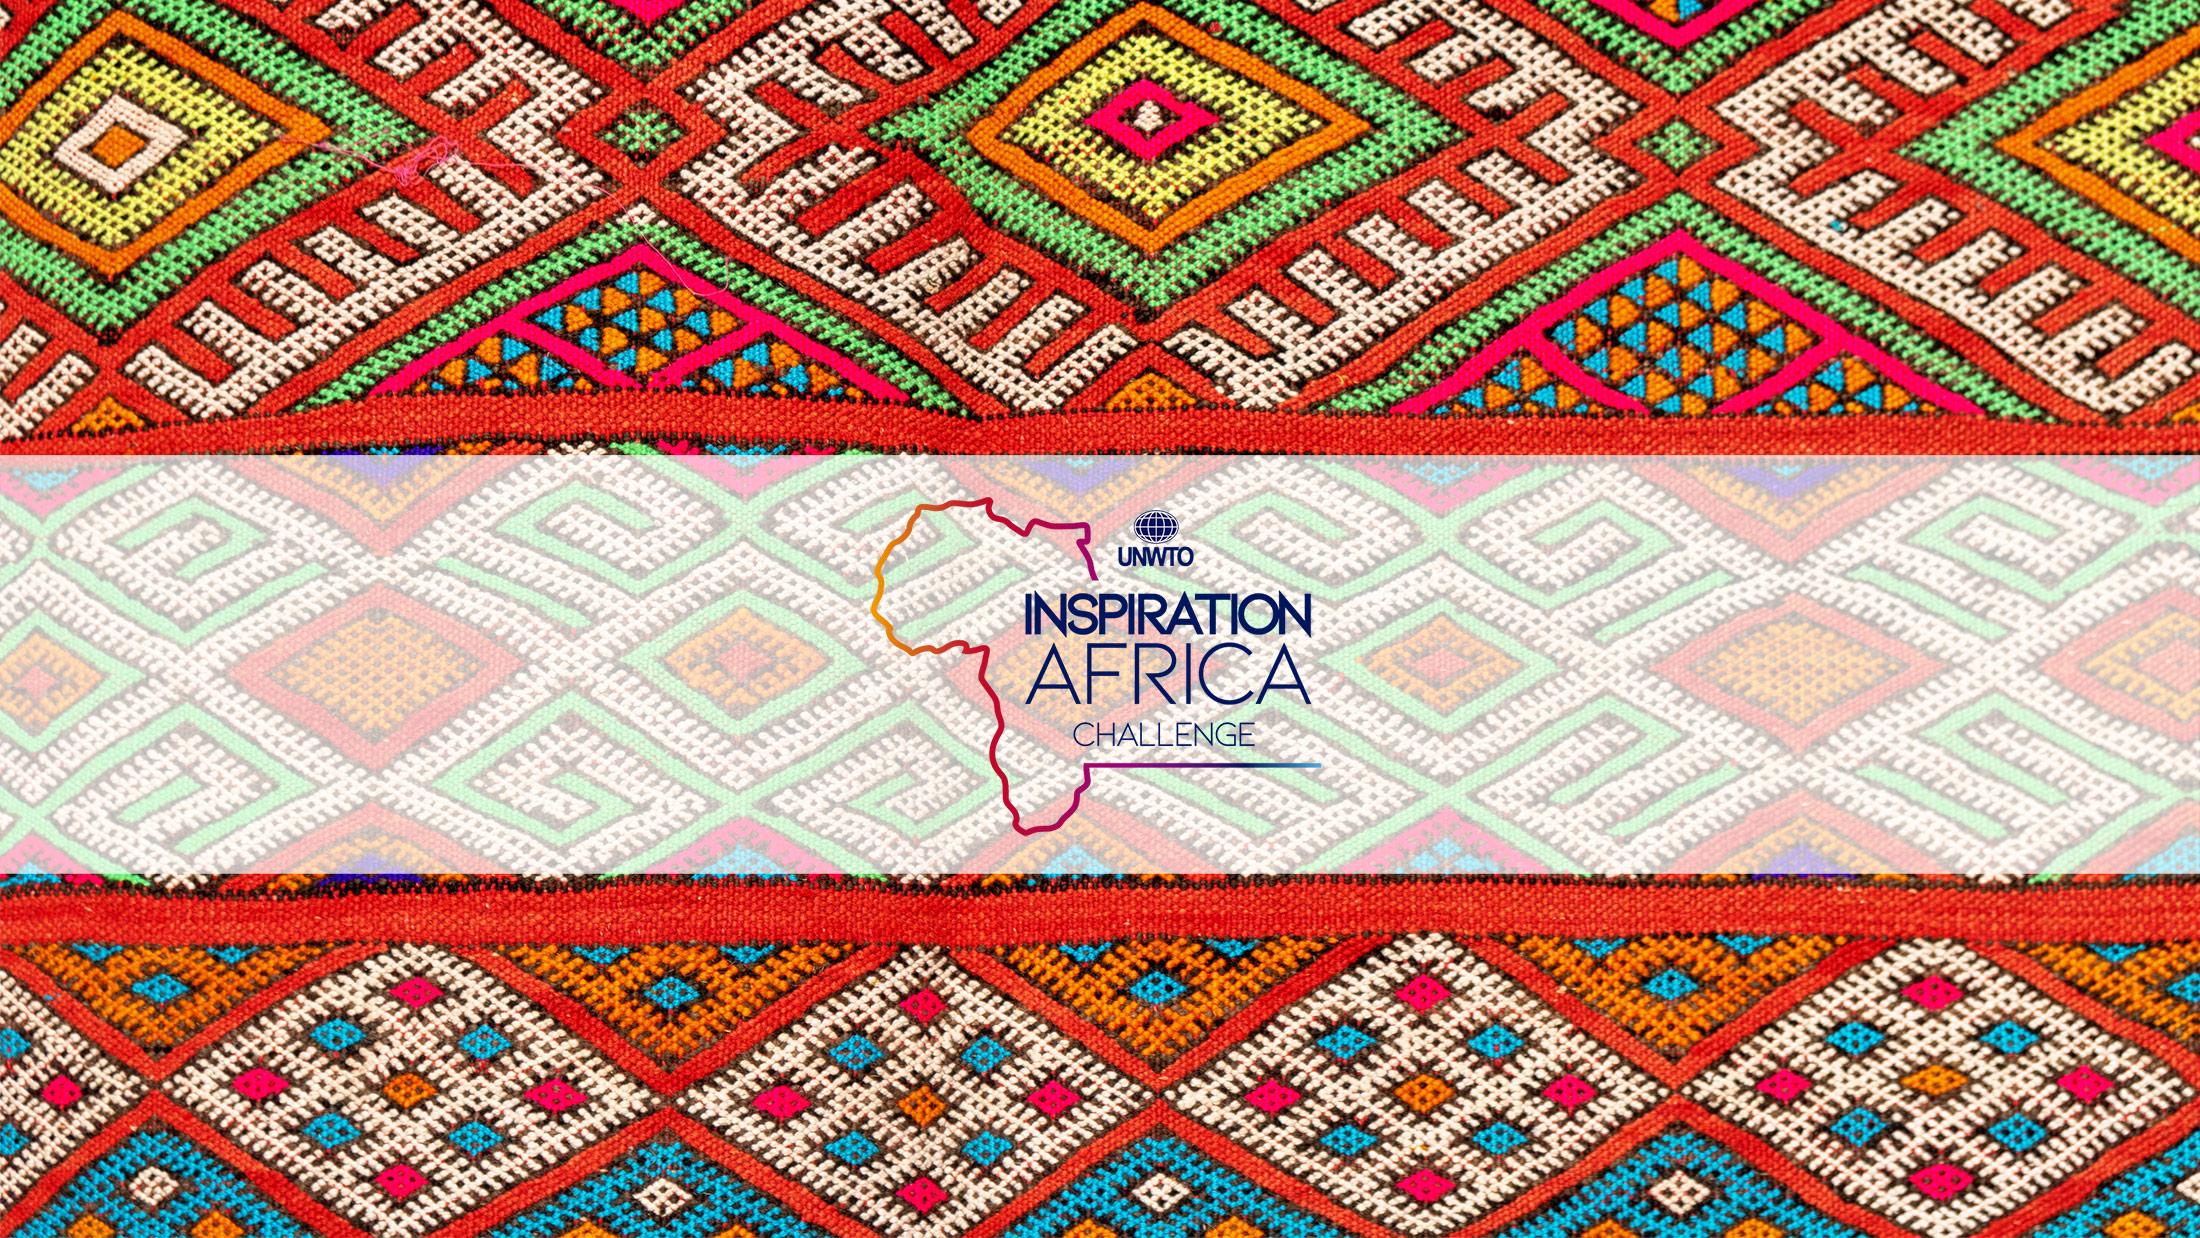 UNWTO Inspiration Africa Branding Challenge